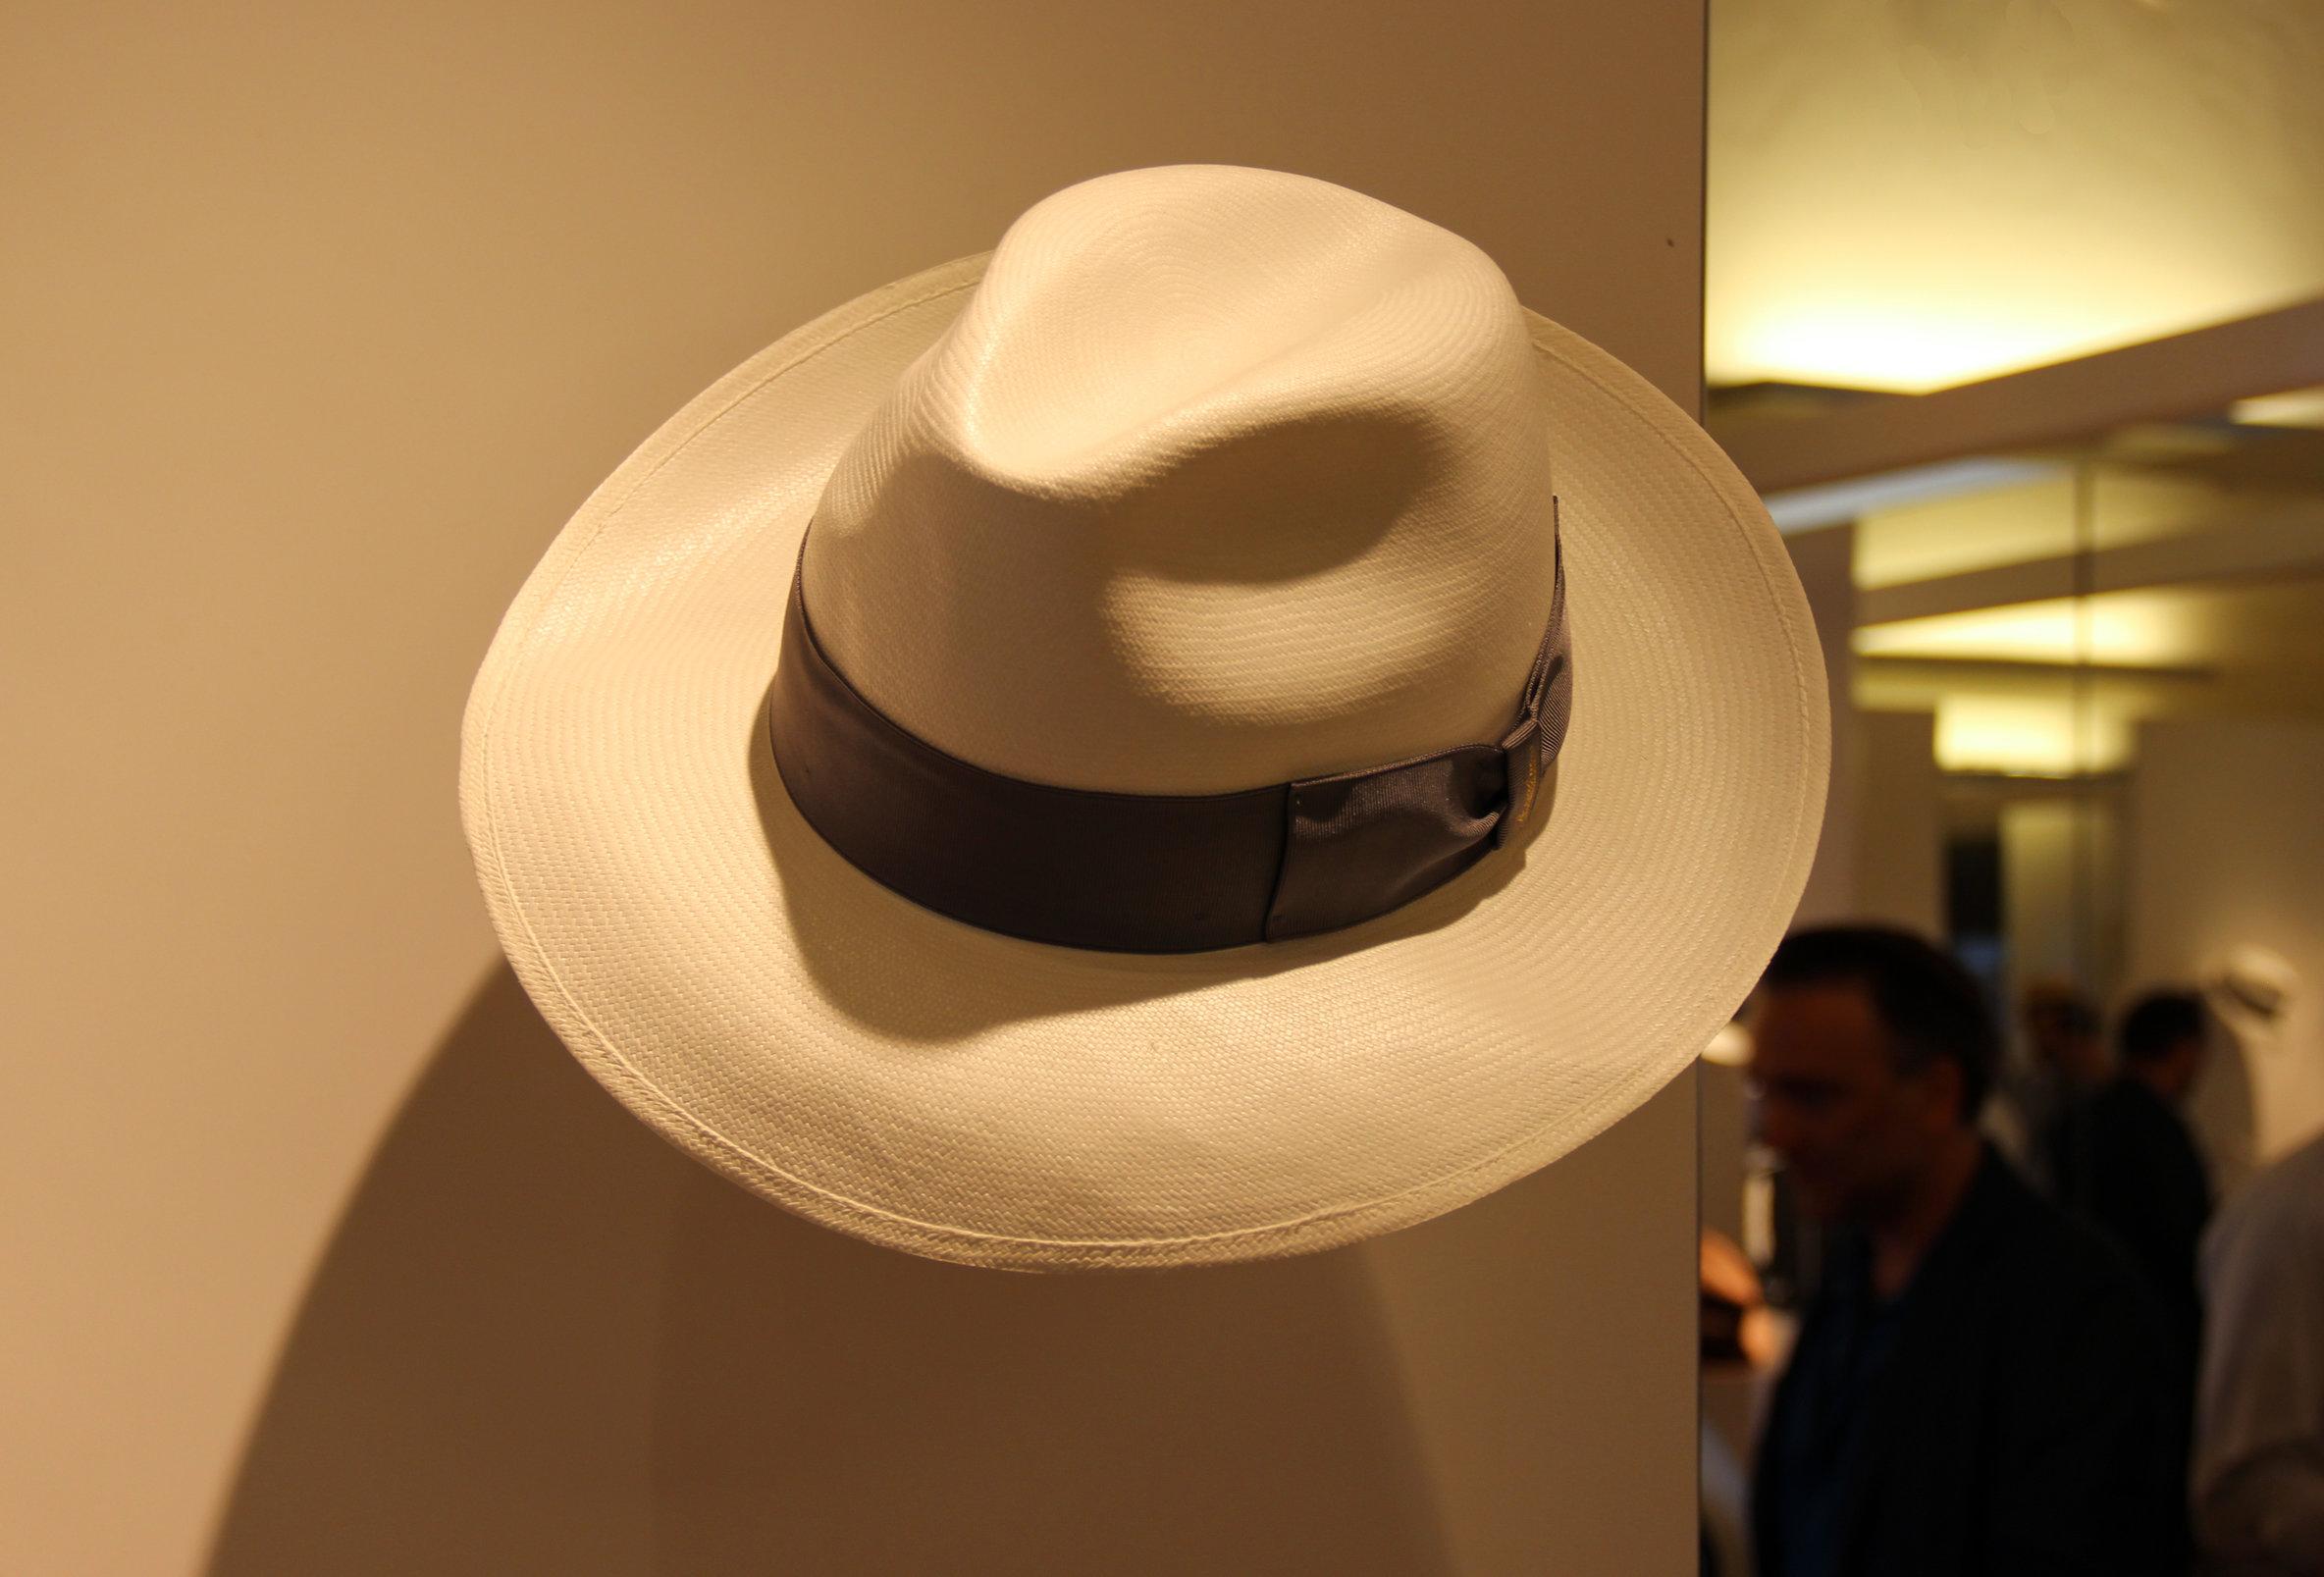 Pitti uomo 90 - Borsalino Hats by LONG STORY SHORT